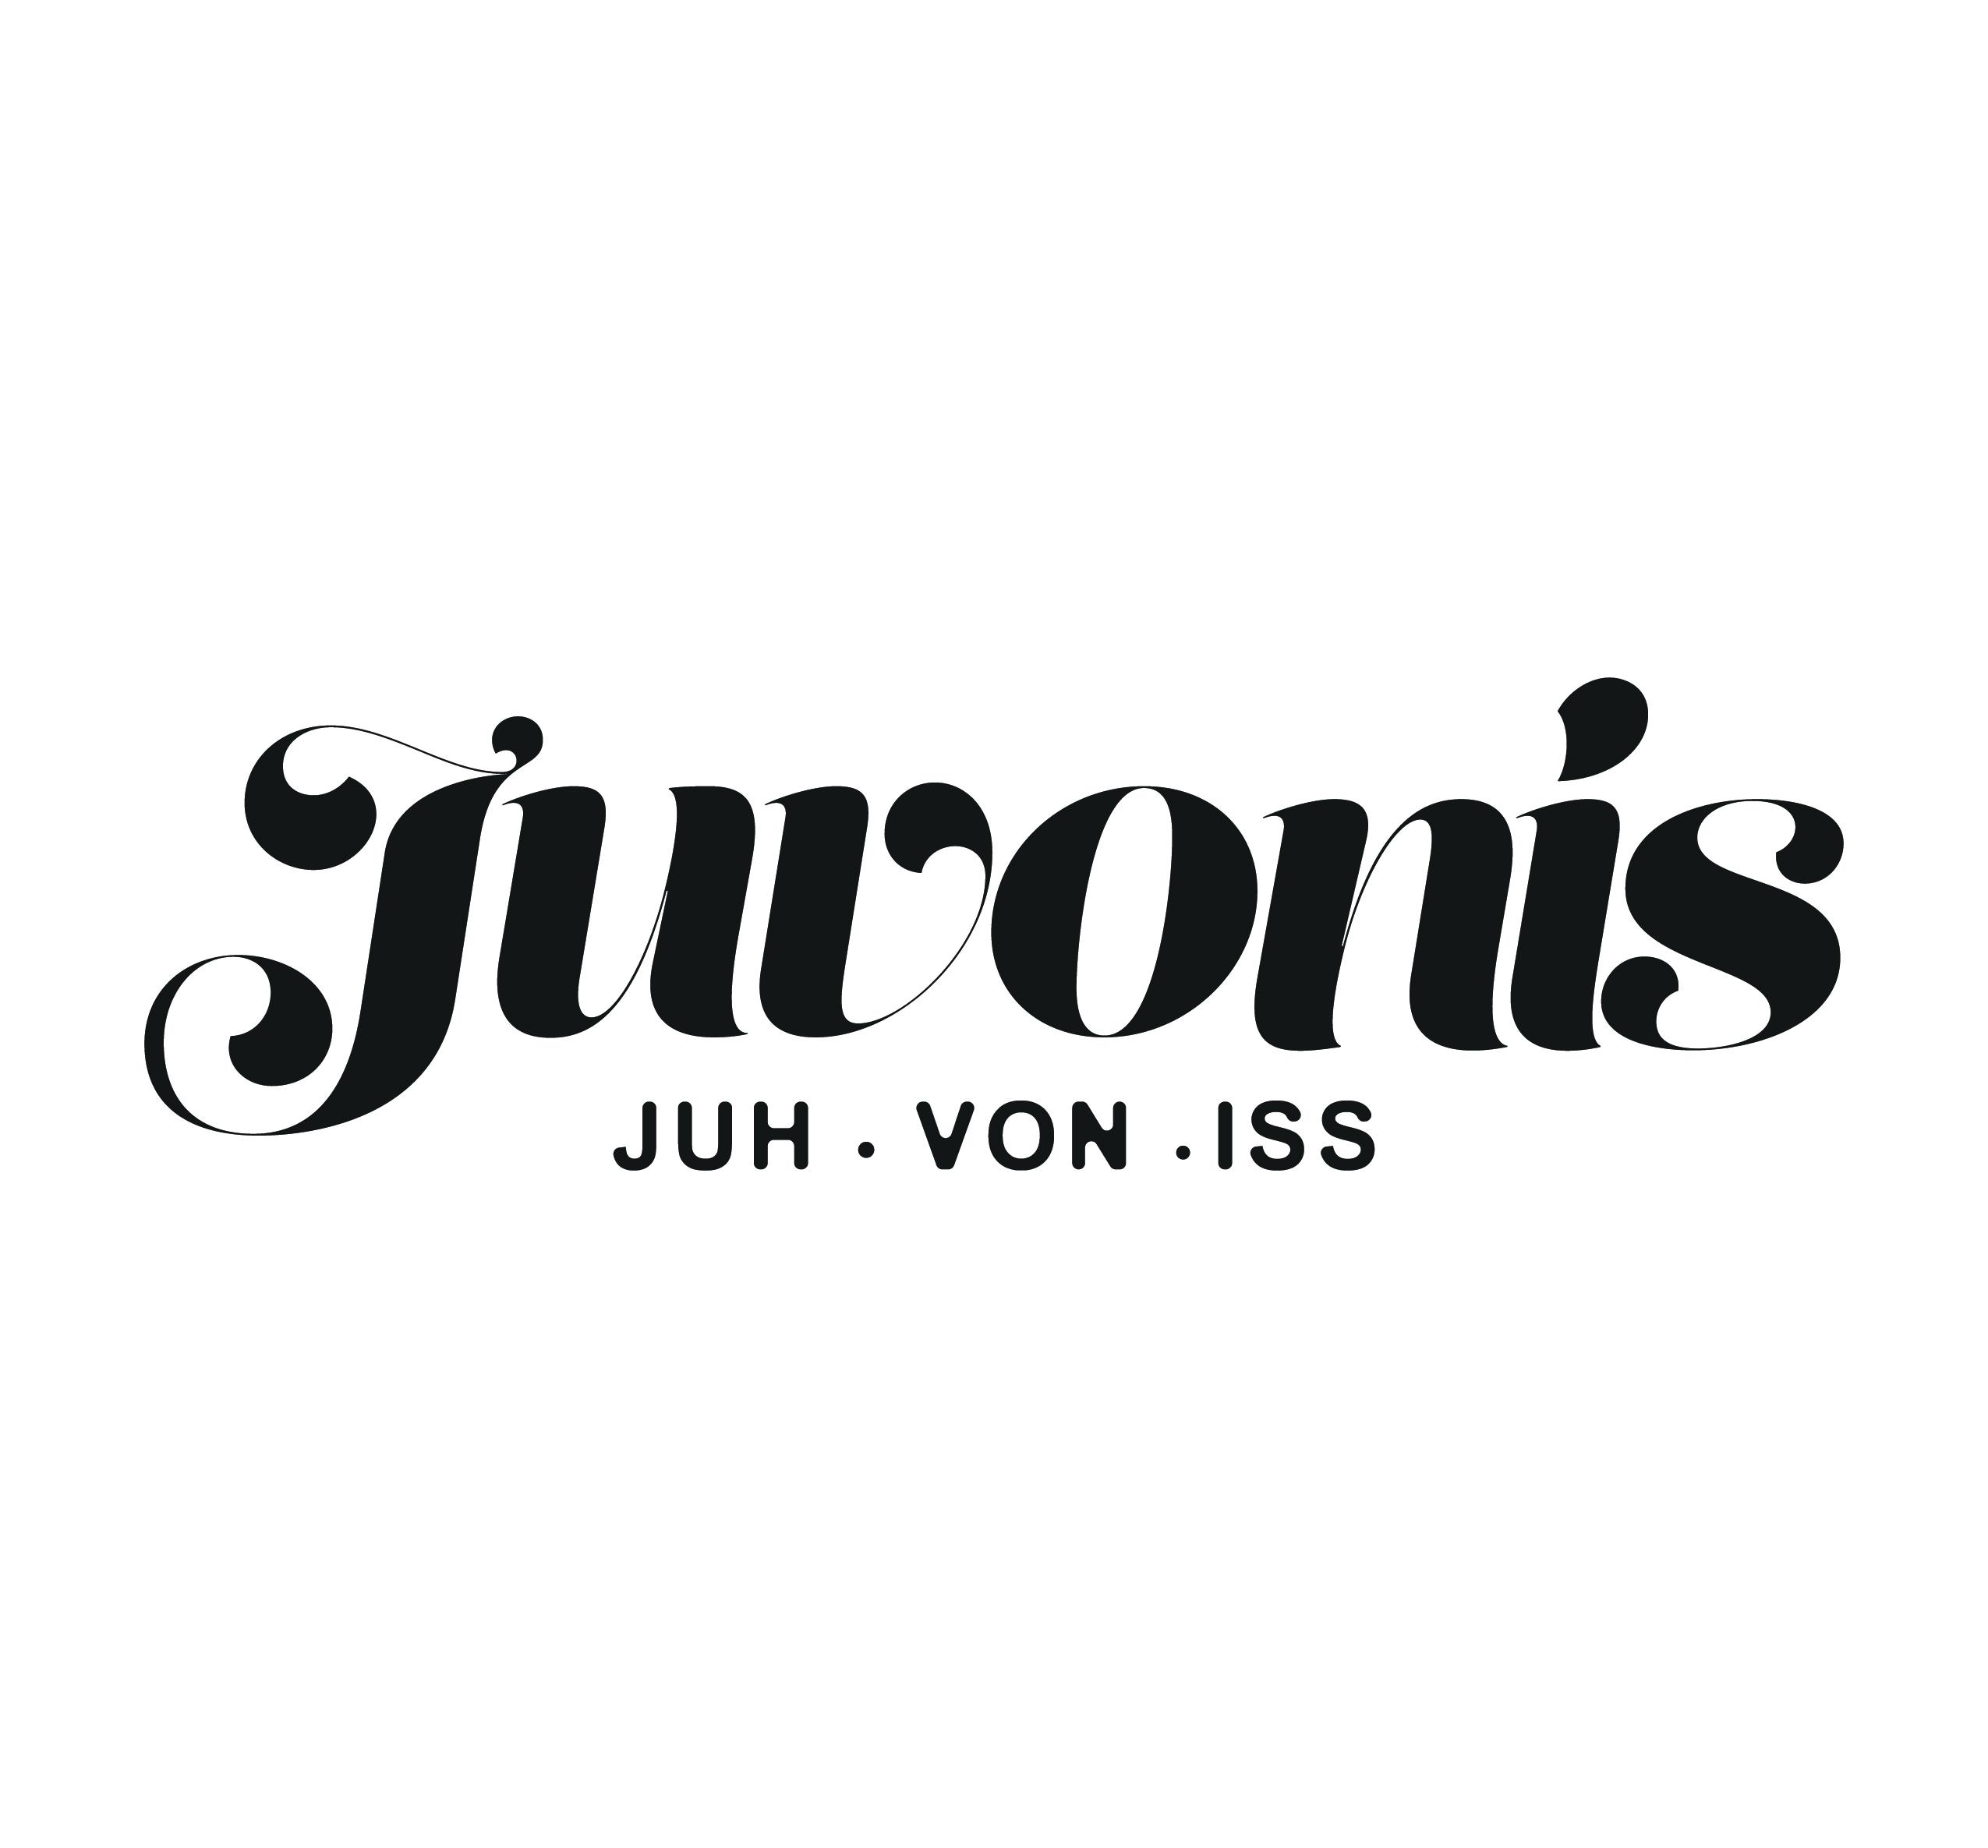 Juvonis Clothing